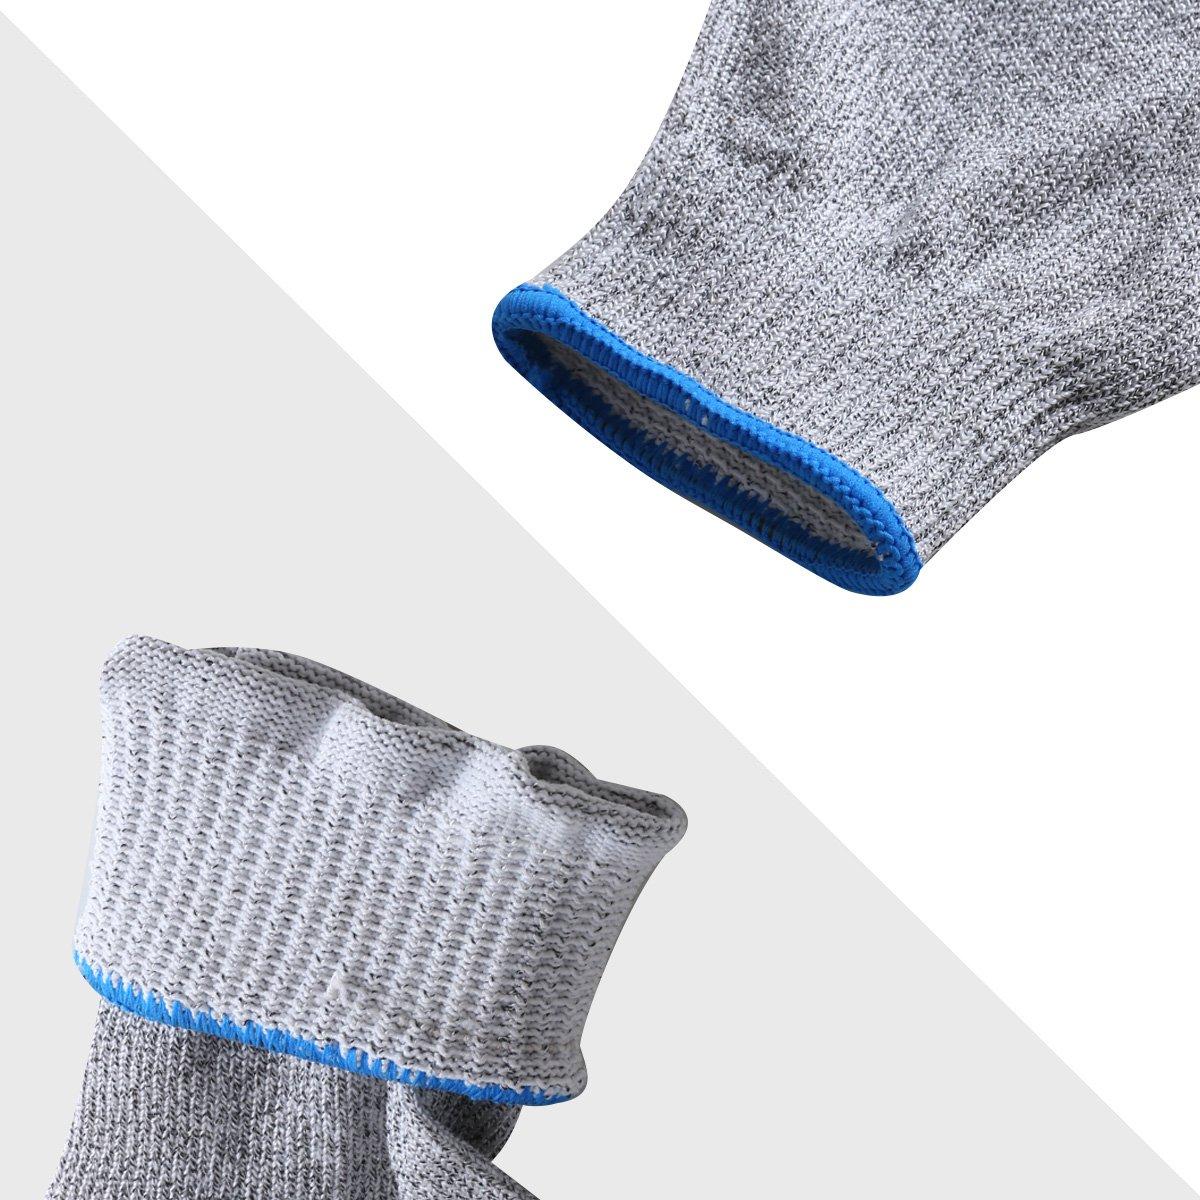 Cut Resistant Gloves IBOWO Kitchen Work Gloves Grey, 1 Pair (Medium) (Medium, Black) (M, BLACK)